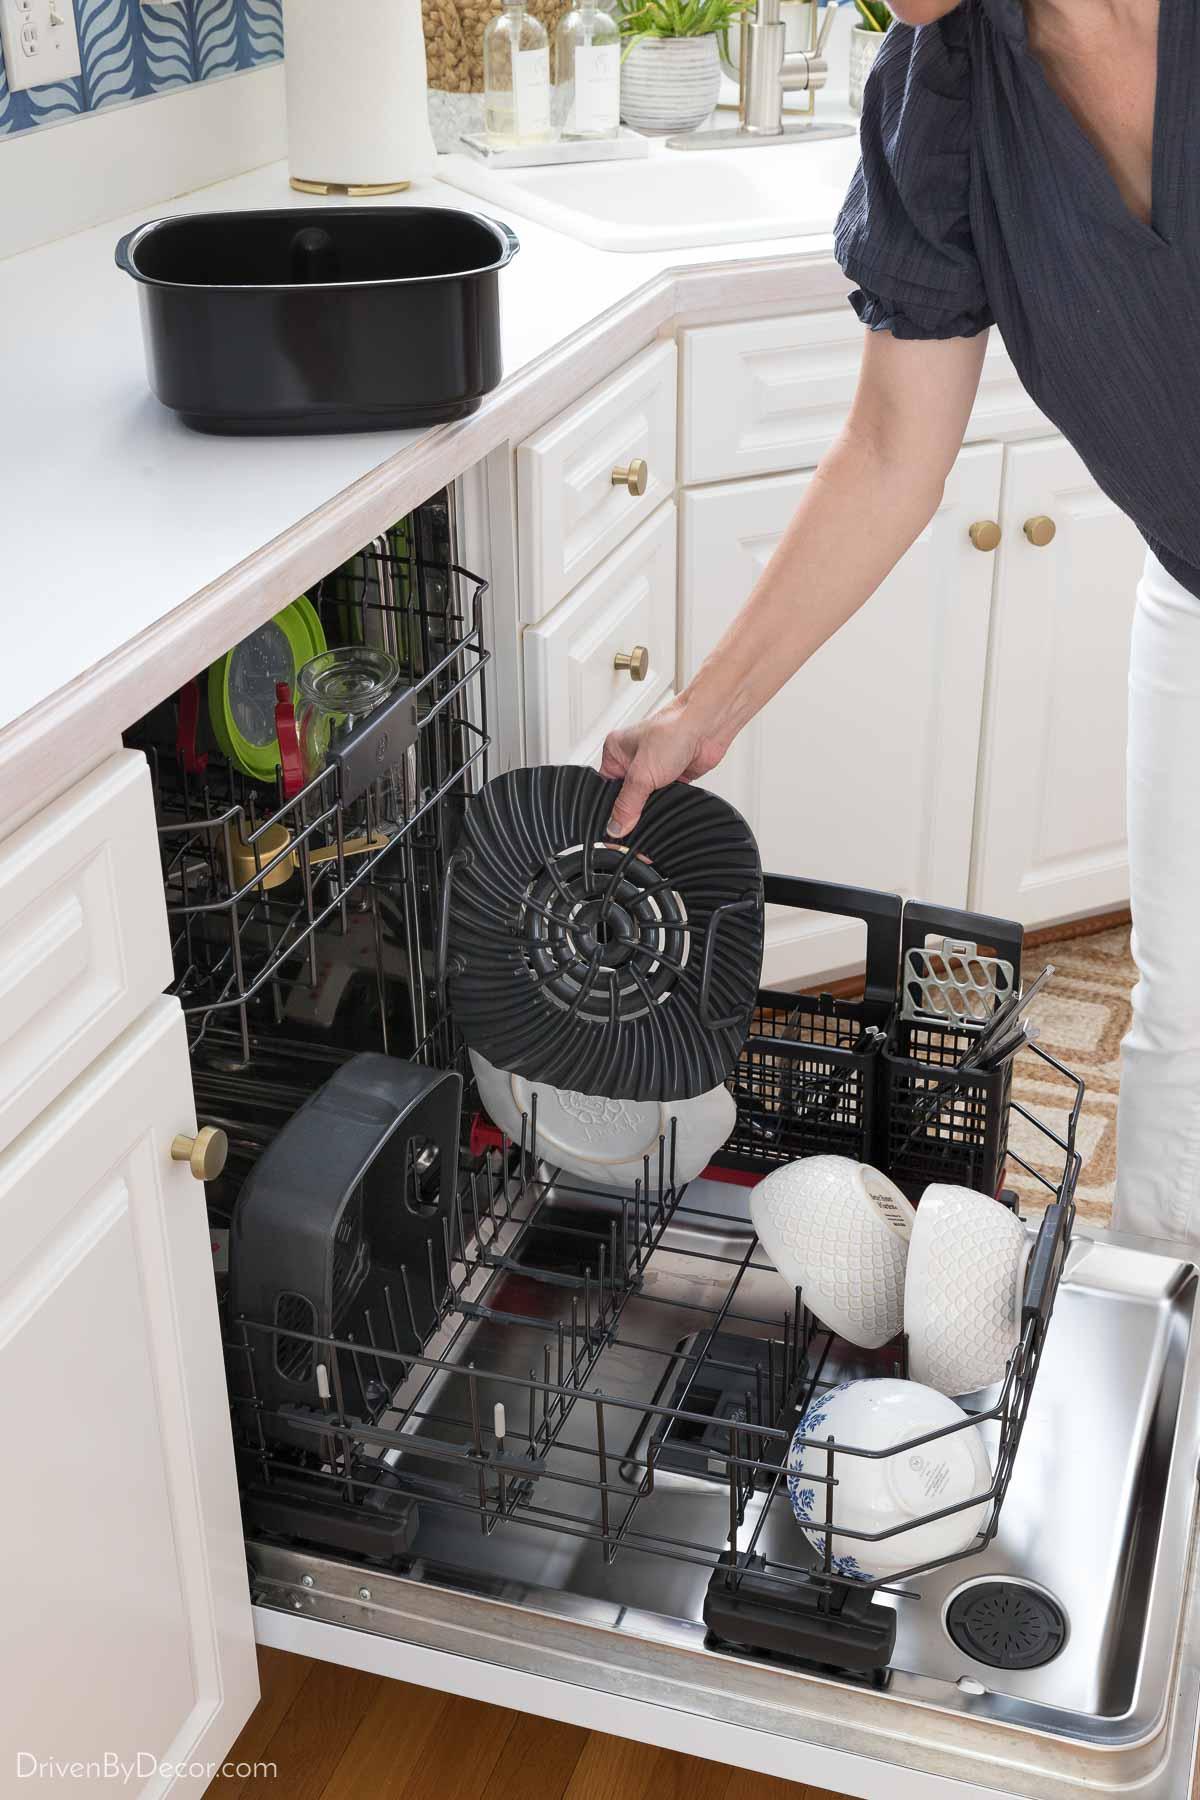 I love that the Ninja Foodi accessories are dishwasher safe!